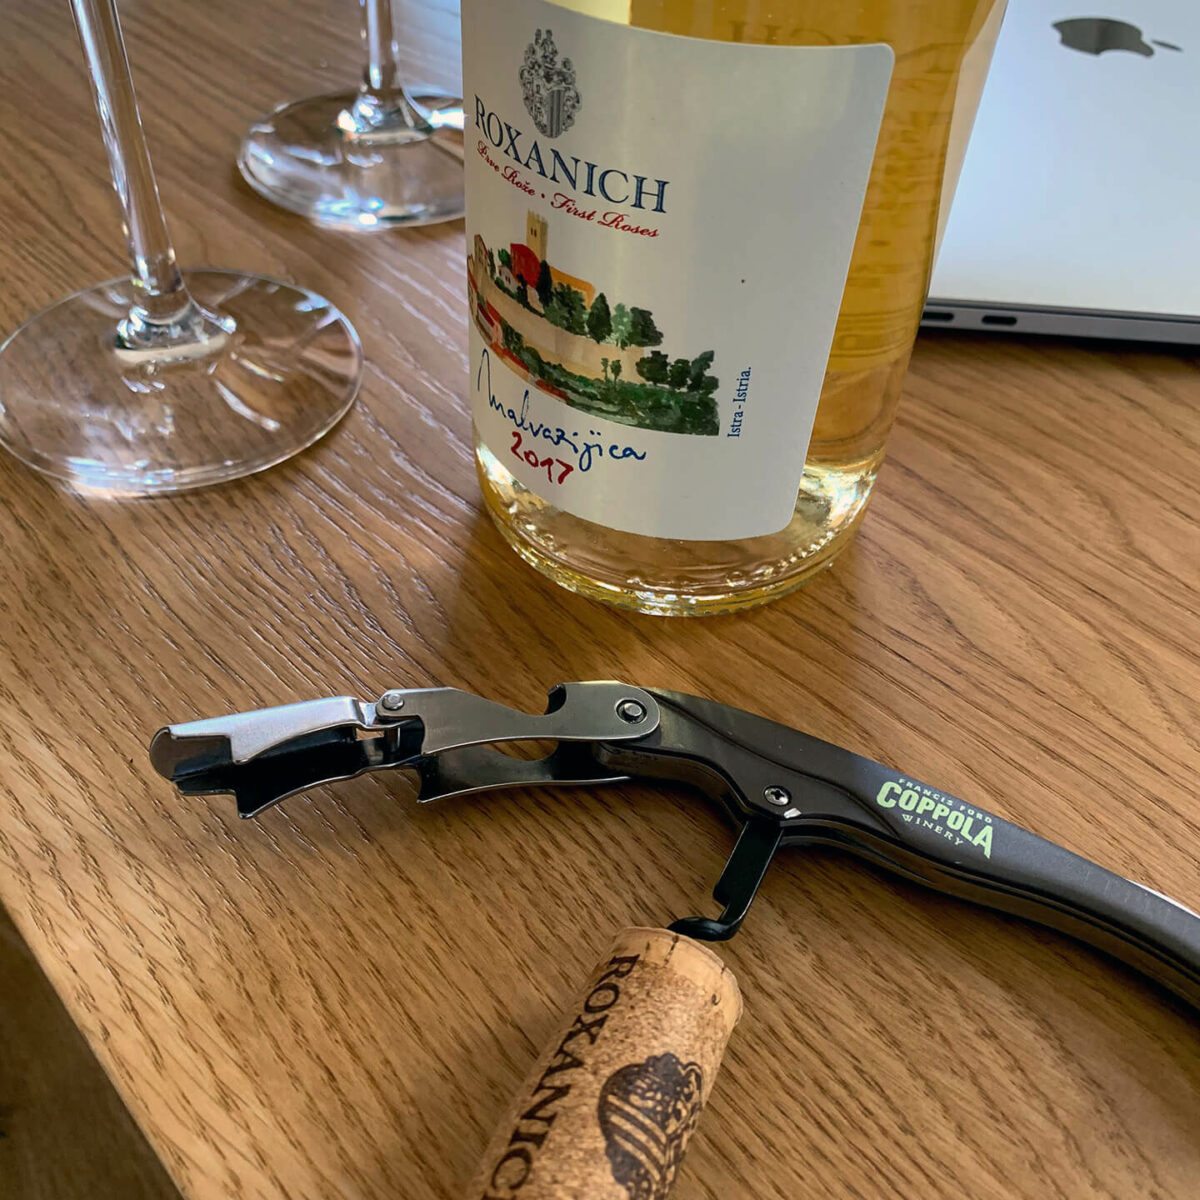 In vino veritas - ROXANICH Winery, Motovun (Foto: Thomas Sommeregger)